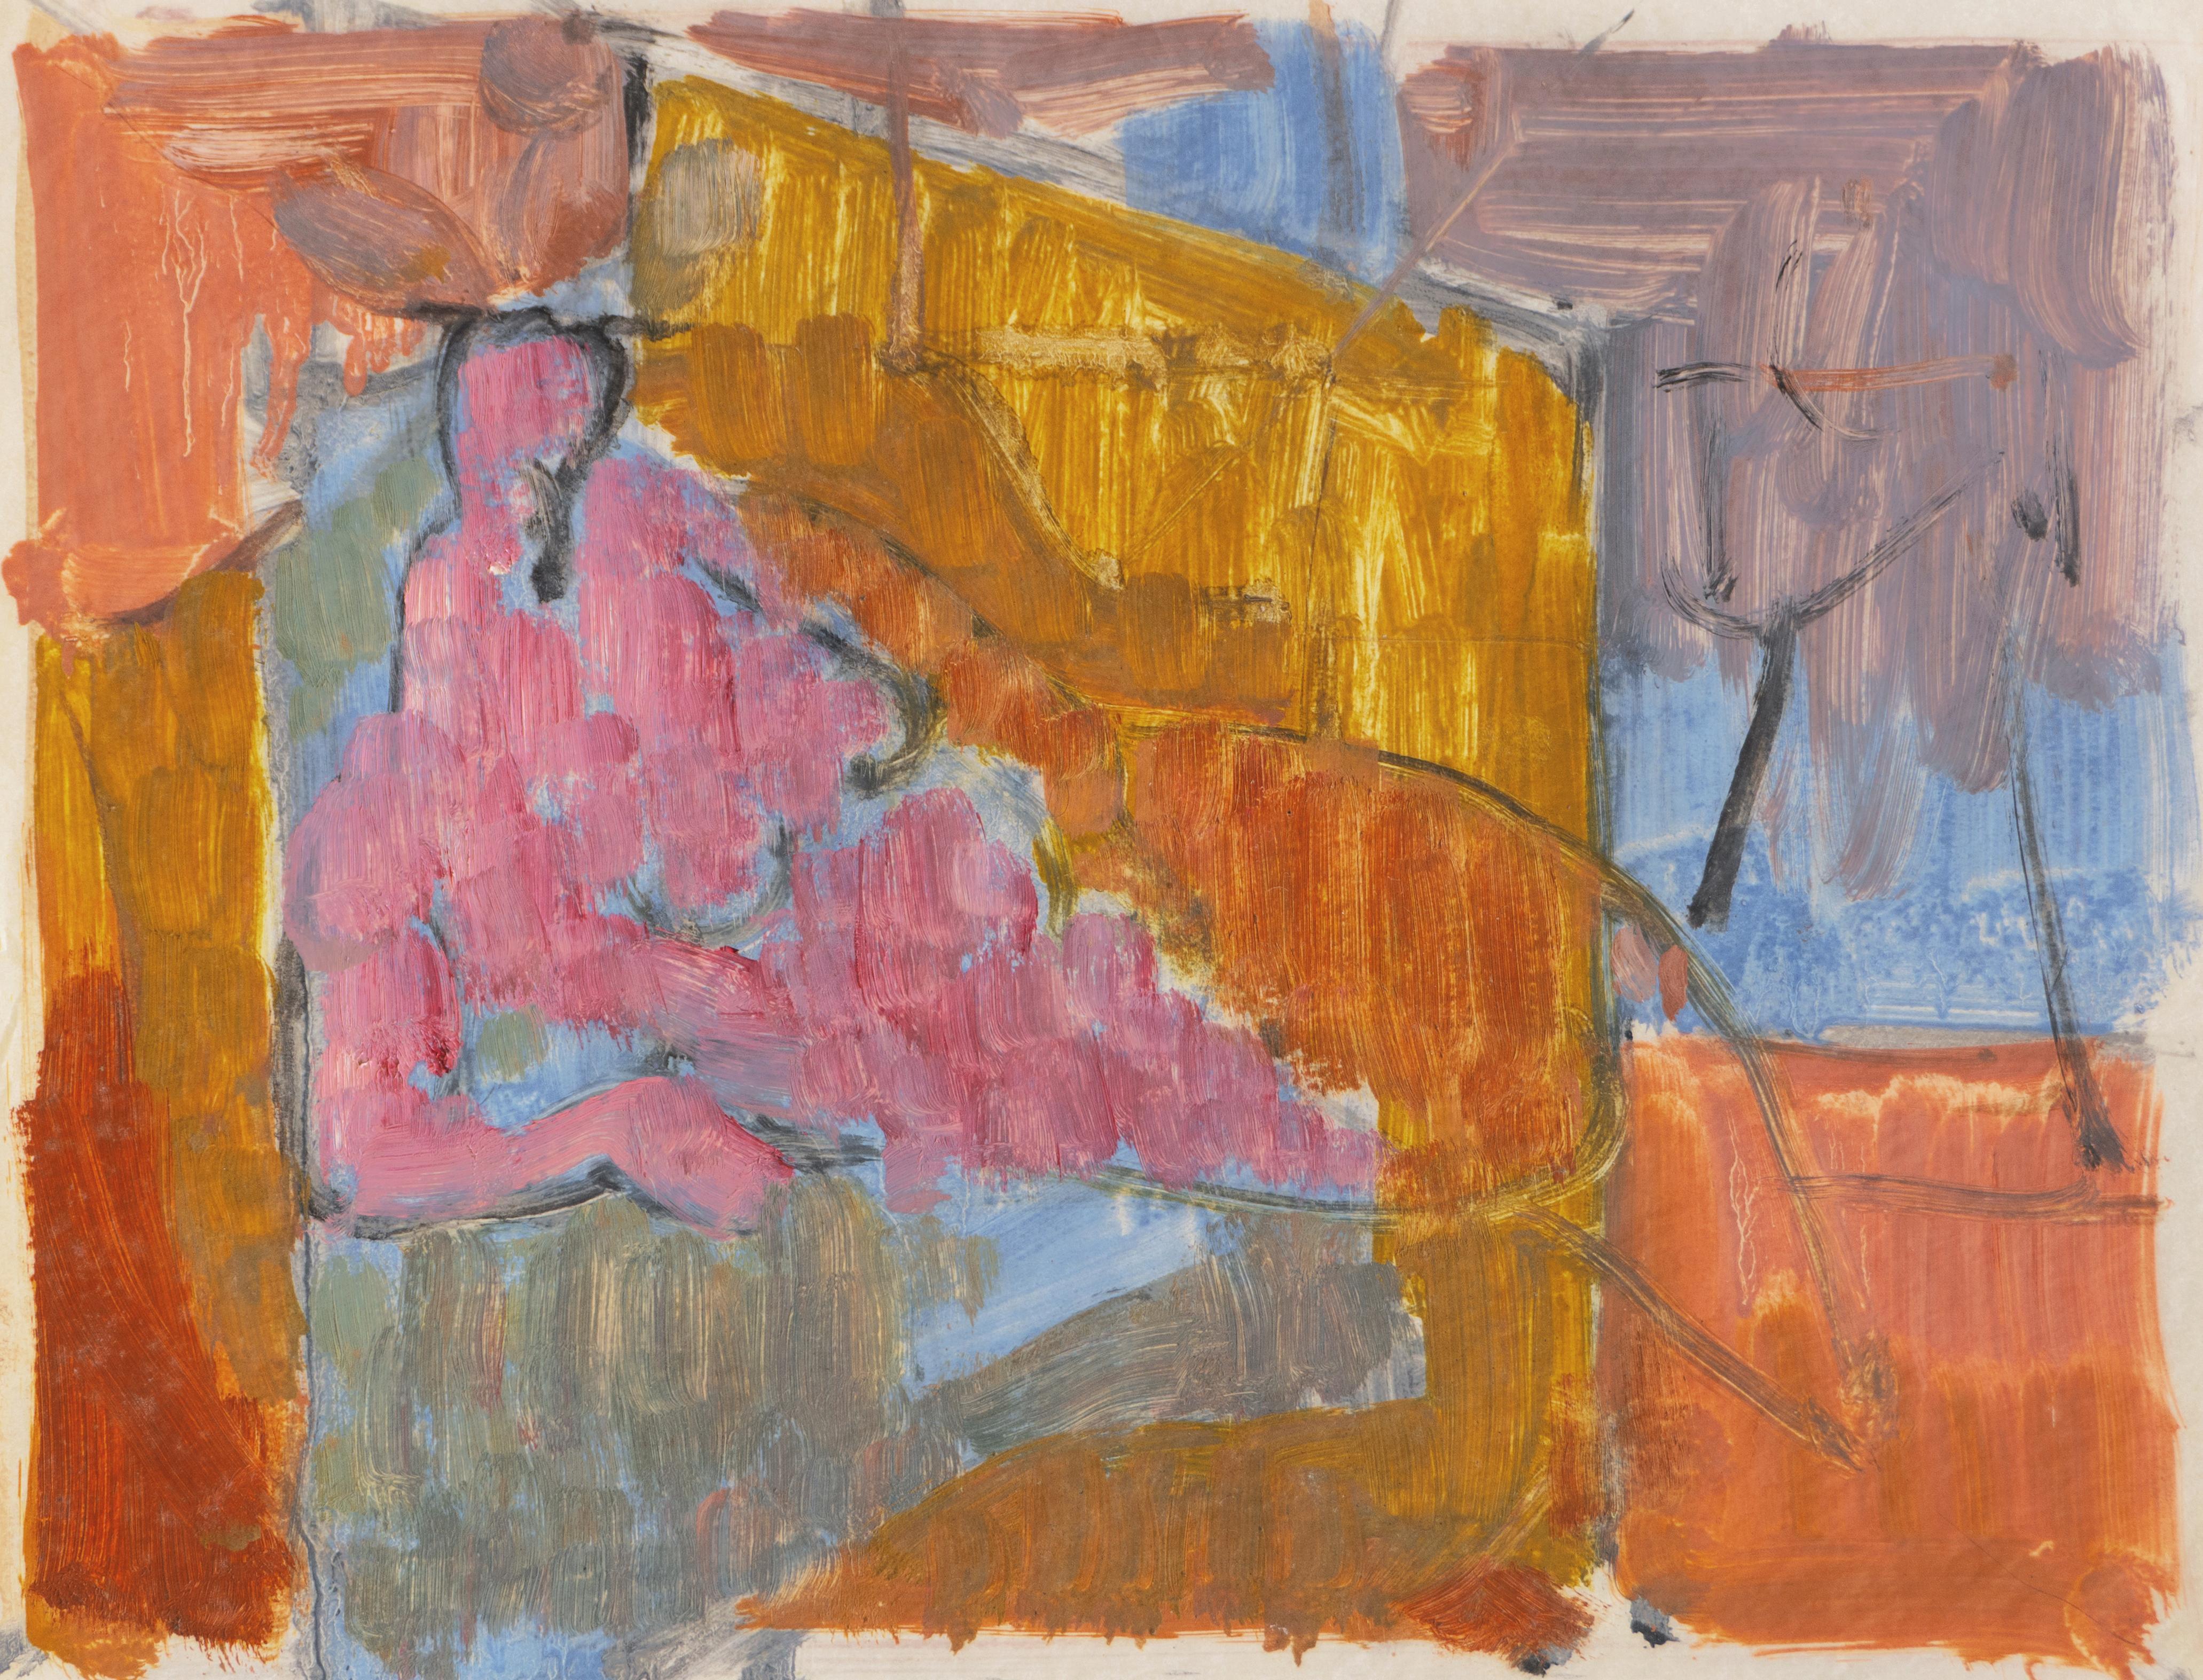 'Reclining Nude', Carmel Artist, Paris, Louvre, Academie Chaumiere, SFAA, LACMA